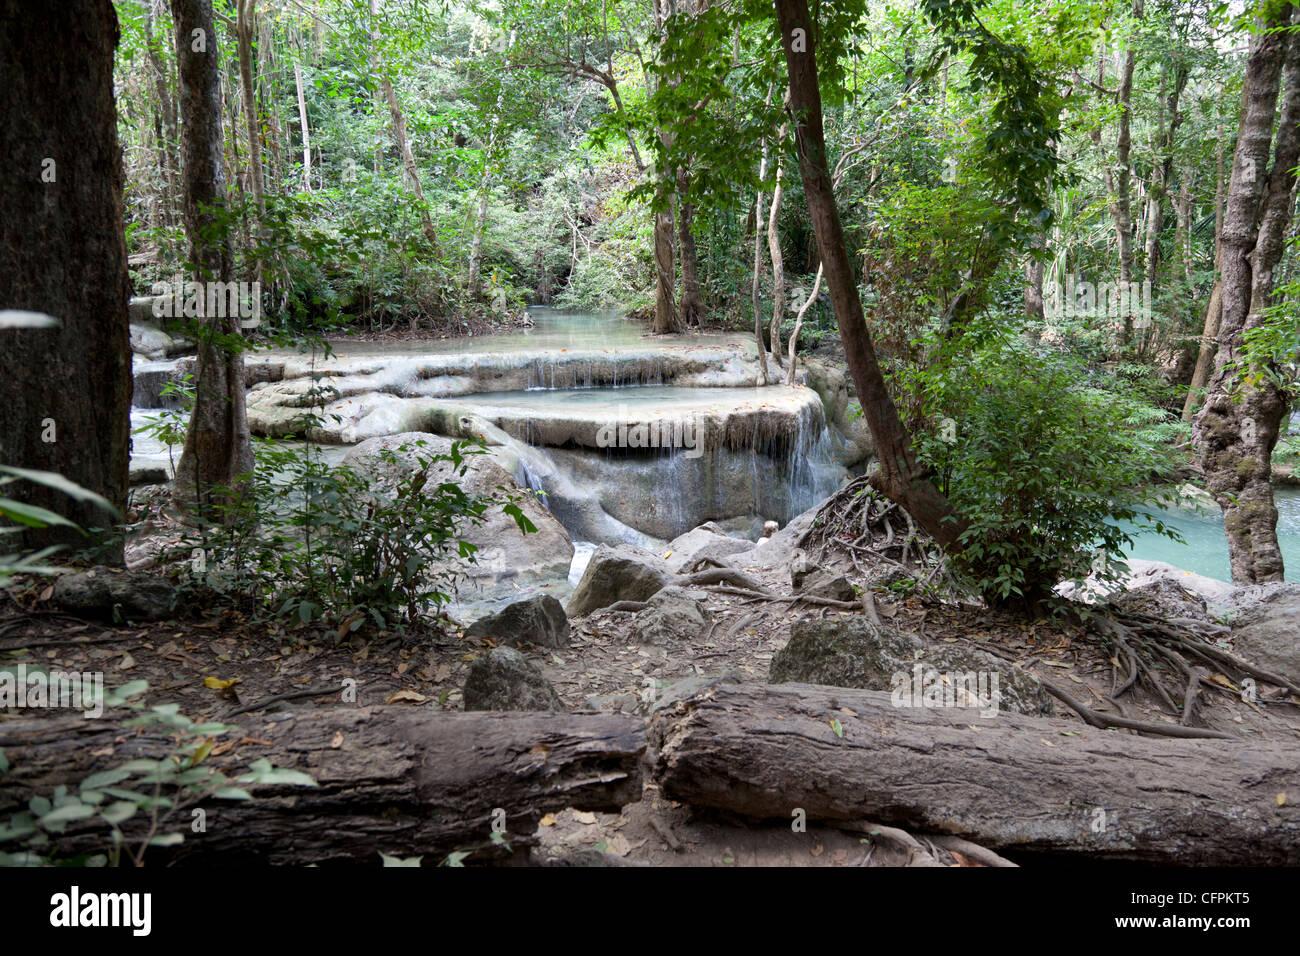 After the rainy season, the tiered Erawan waterfall (Kanchanaburi-Thailand). La cascade à rebonds d'Erawan - Stock Image